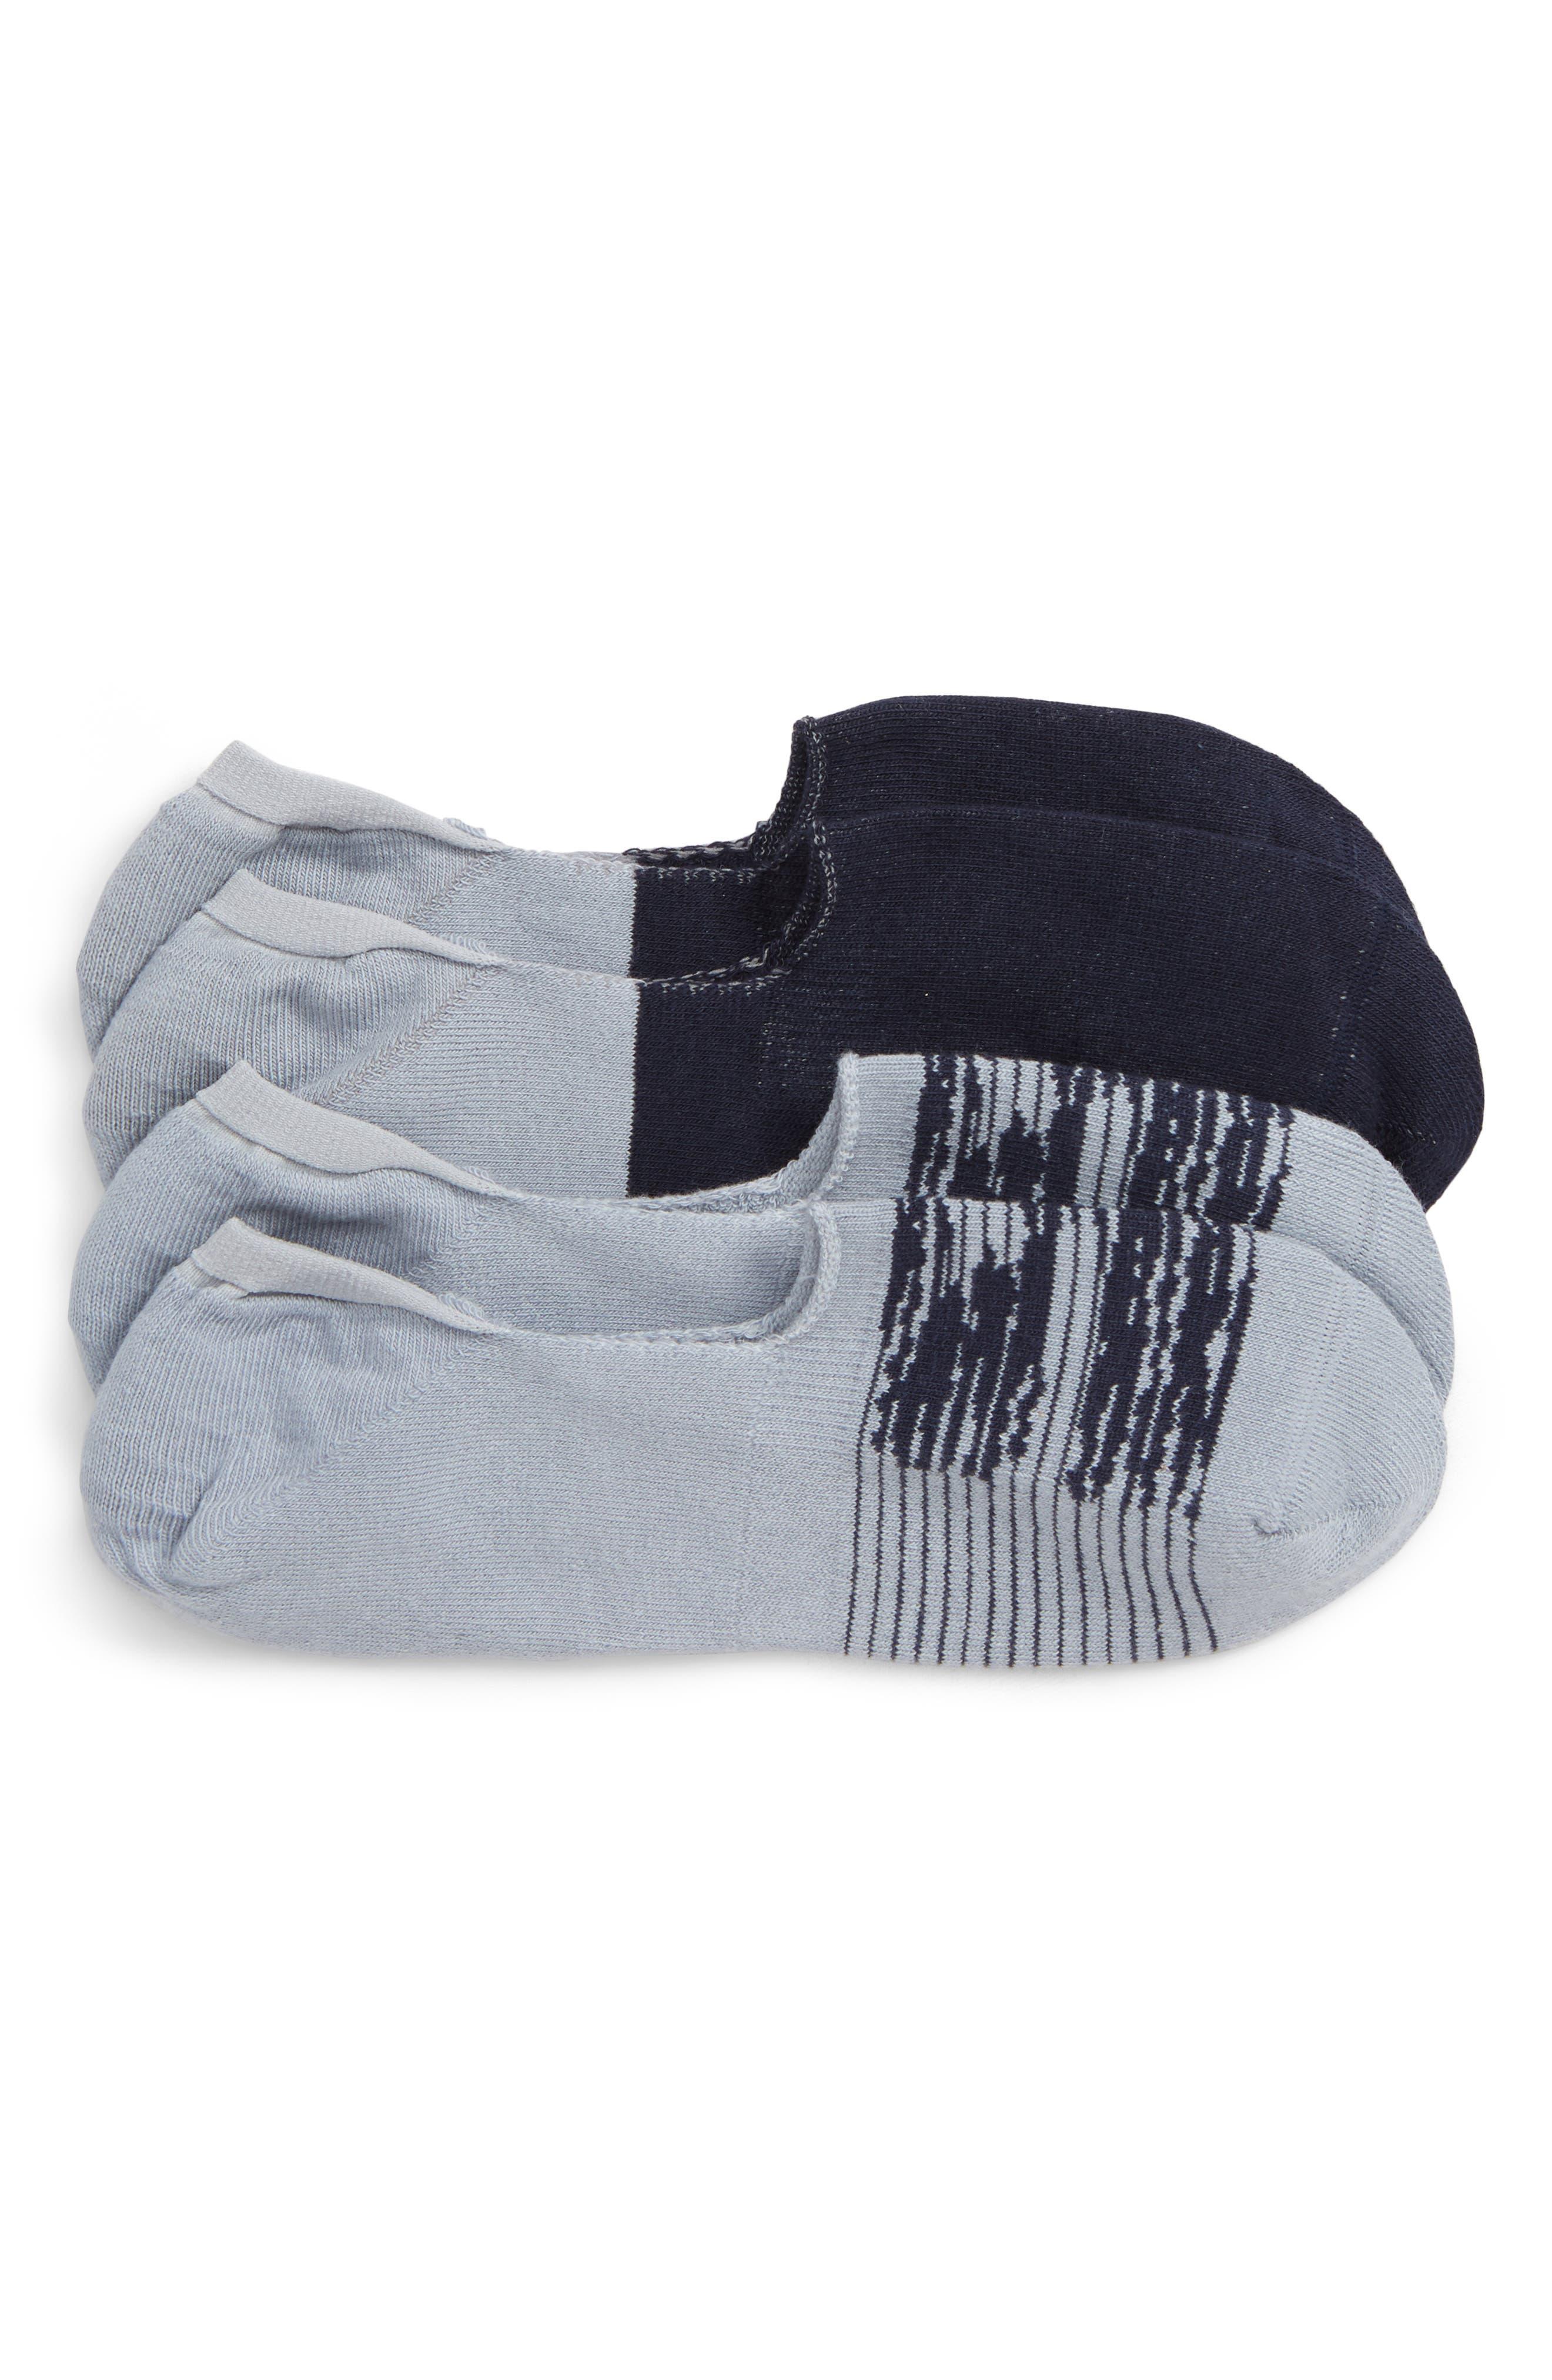 NORDSTROM MEN'S SHOP, Assorted 2-Pack Liner Socks, Main thumbnail 1, color, GREY/ NAVY